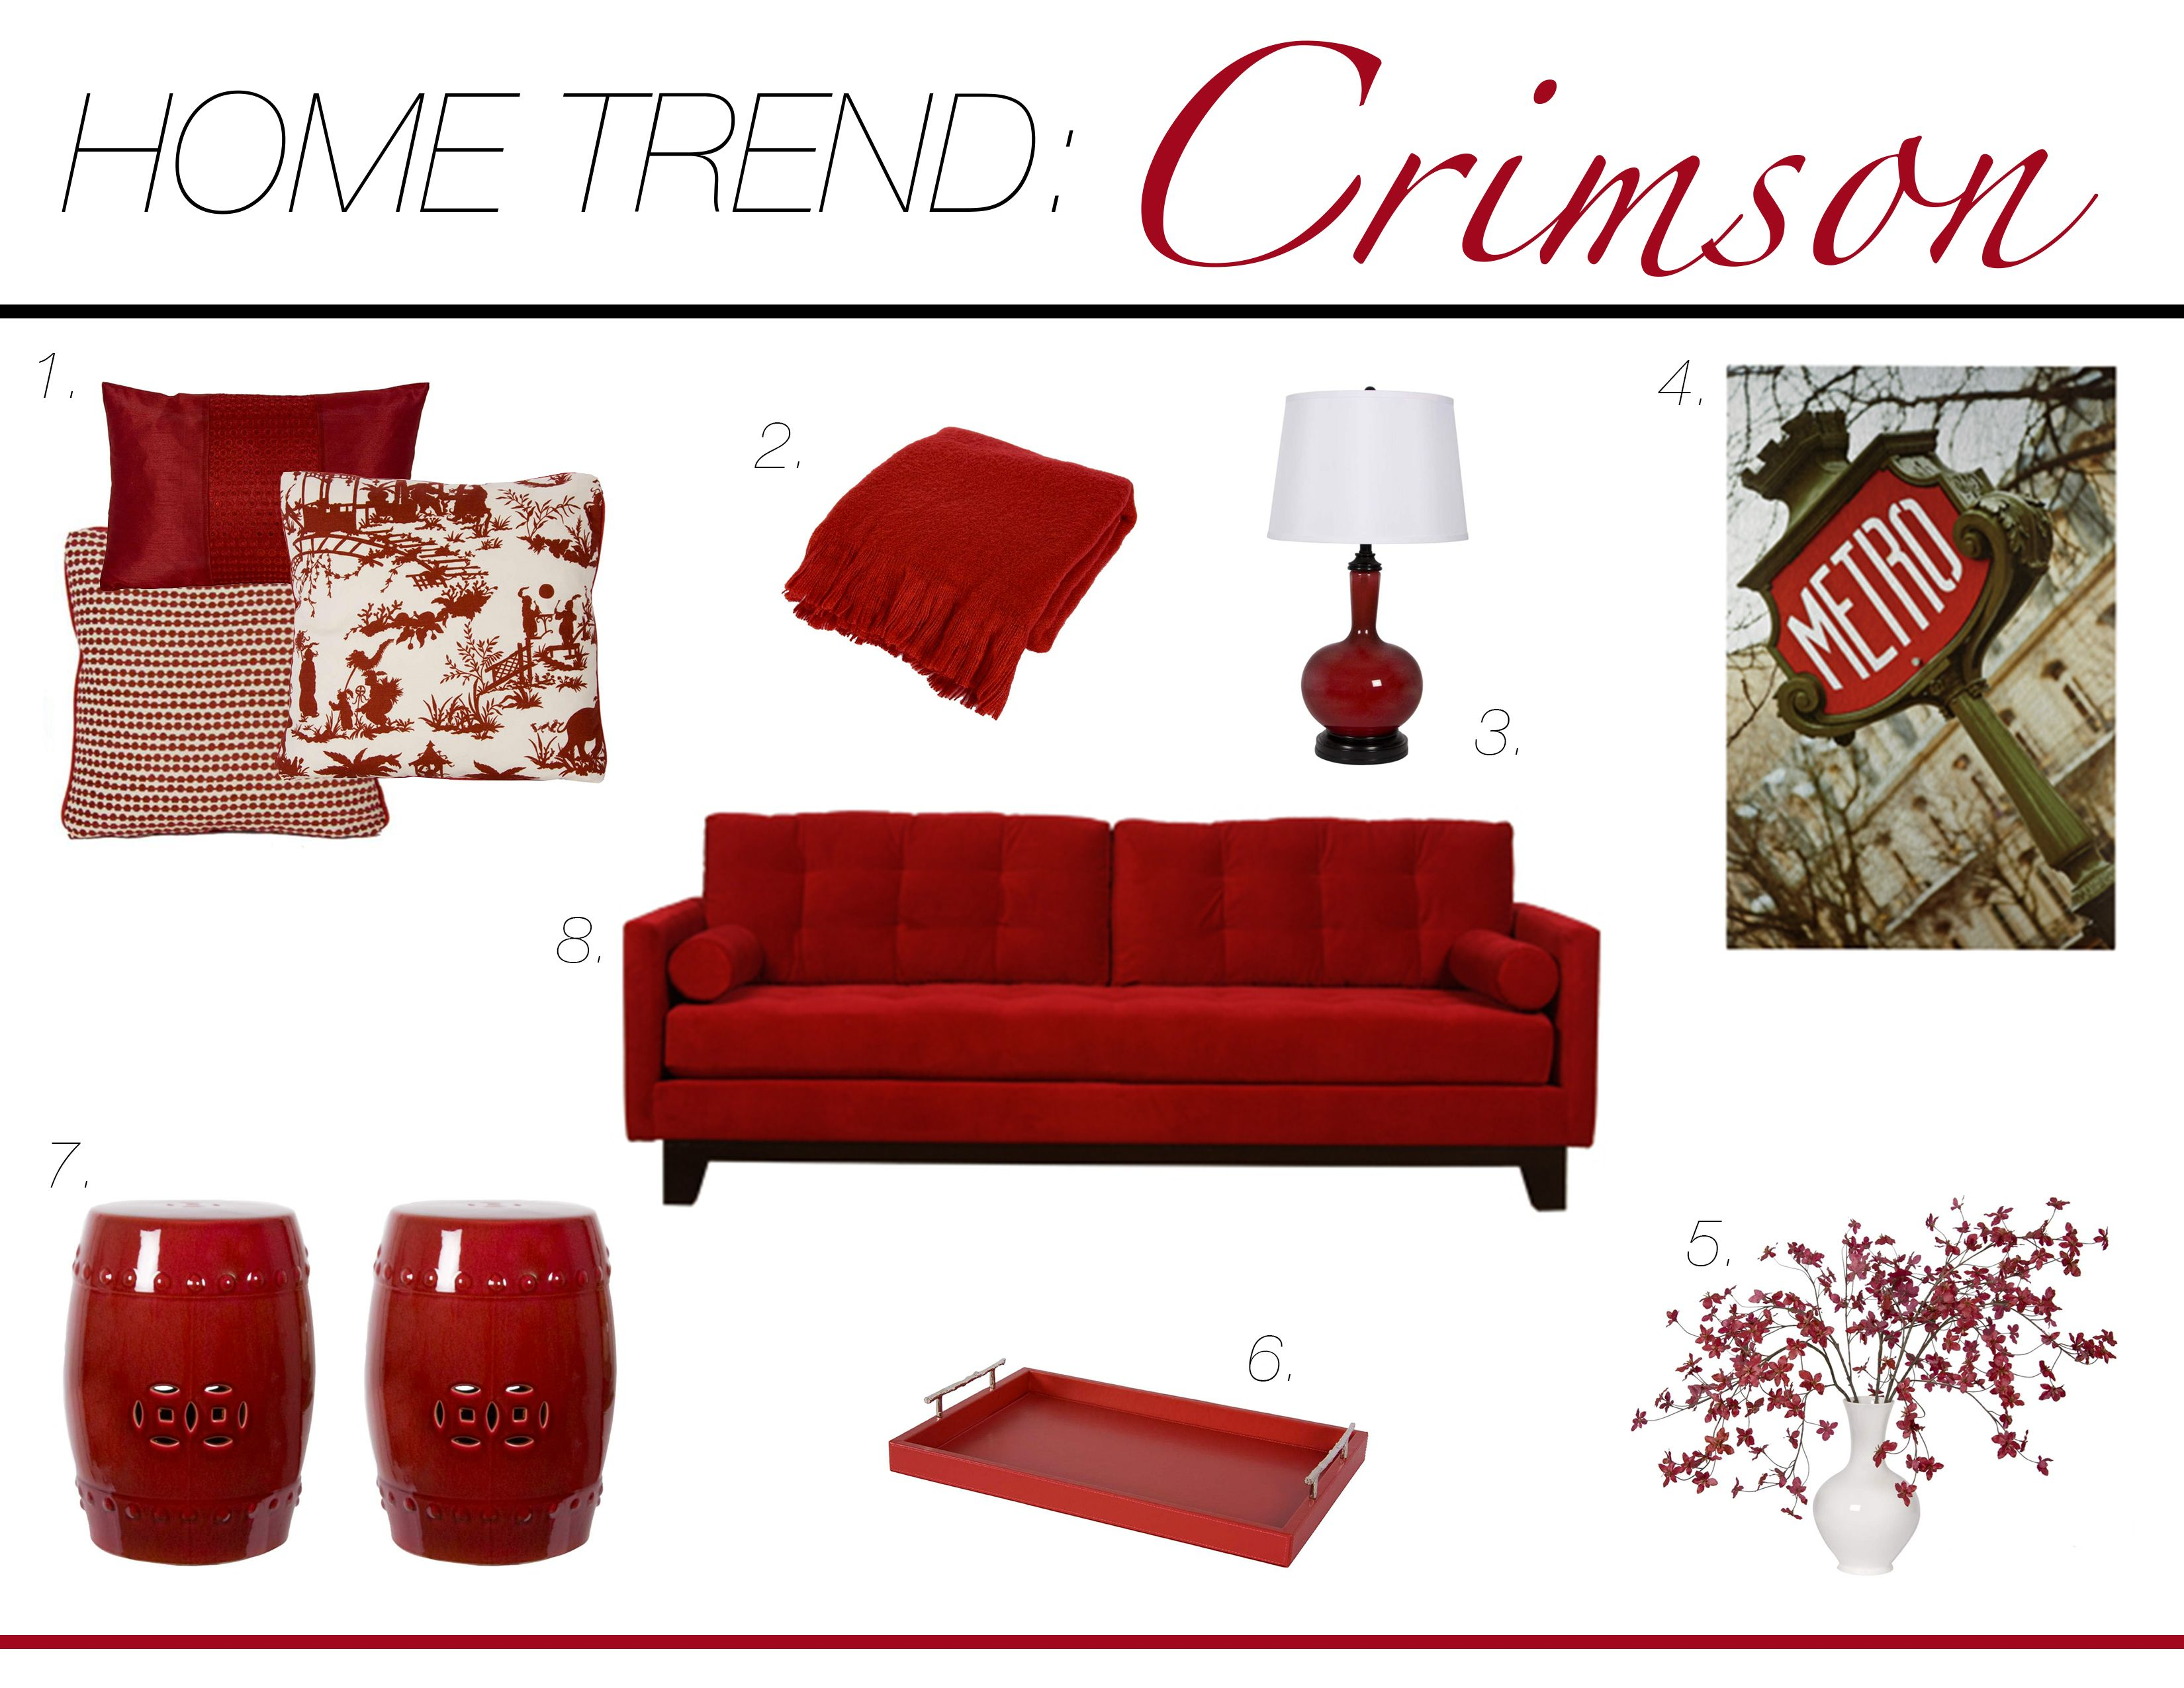 mhd_hometrend_crimson.jpg (3300×2550) | All Red | Pinterest | Red ...